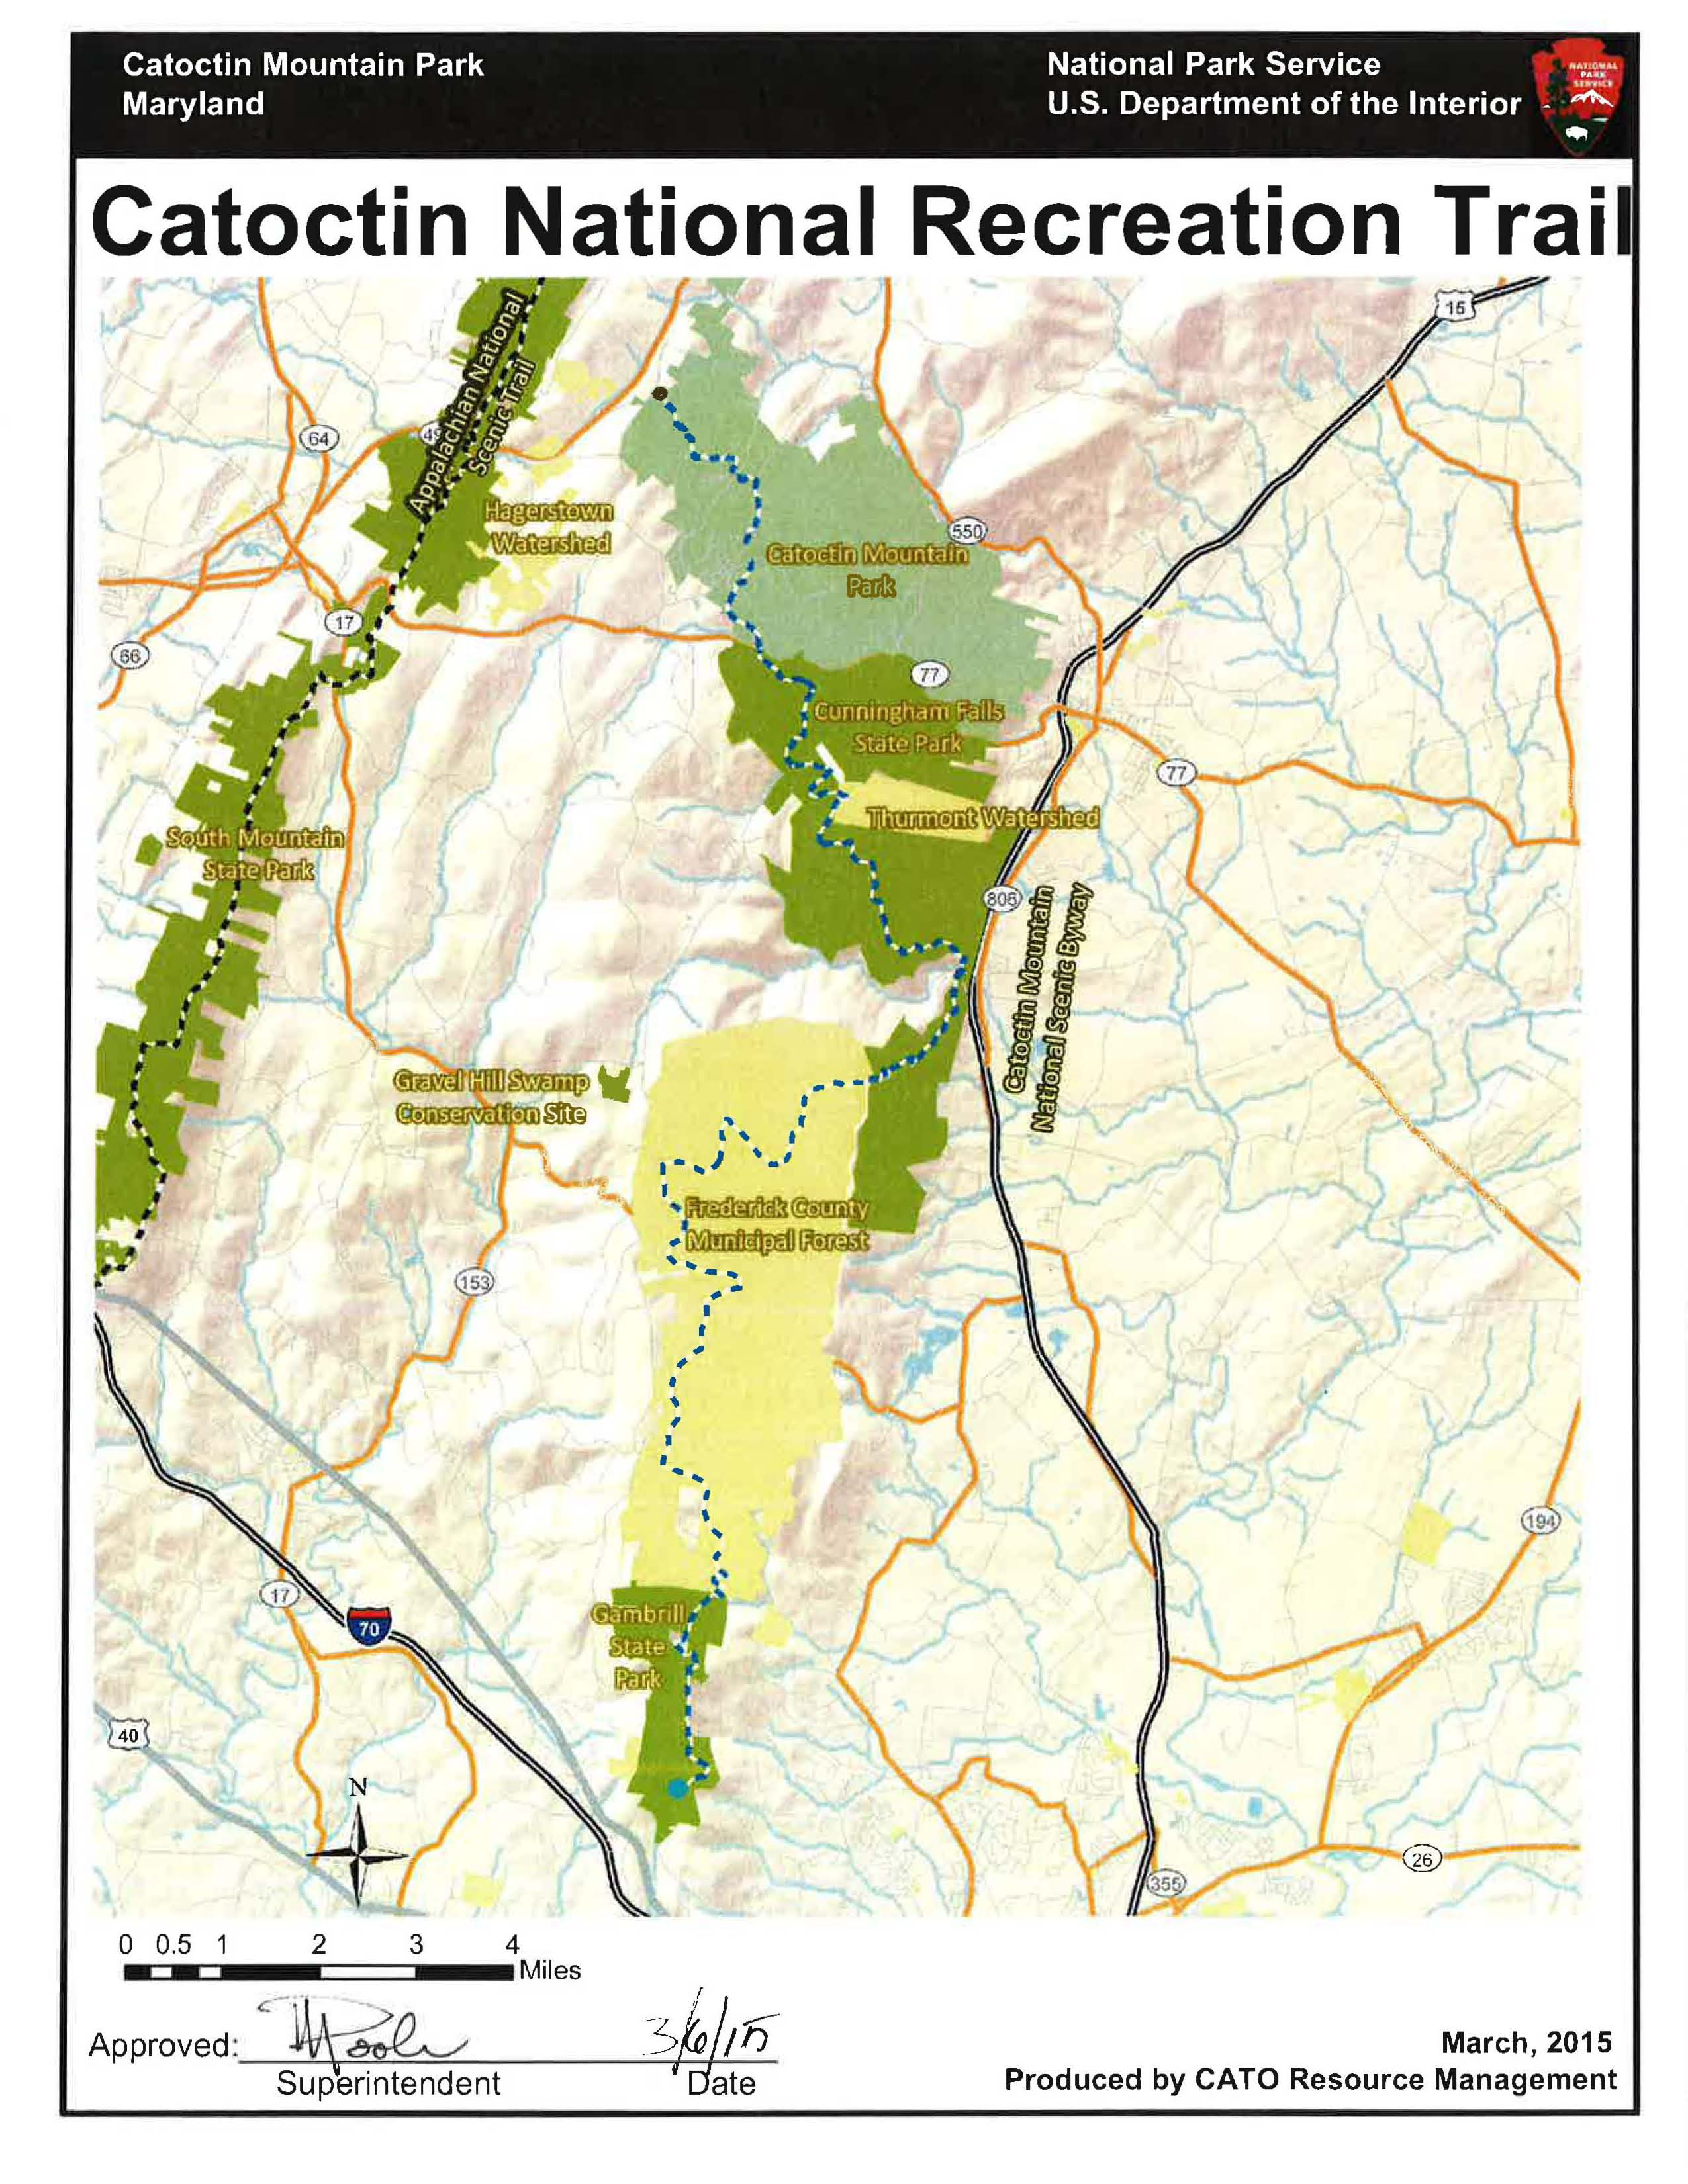 Catoctin National Recreation Trail Catoctin Mountain Park US - Eastern us mountain ranges map